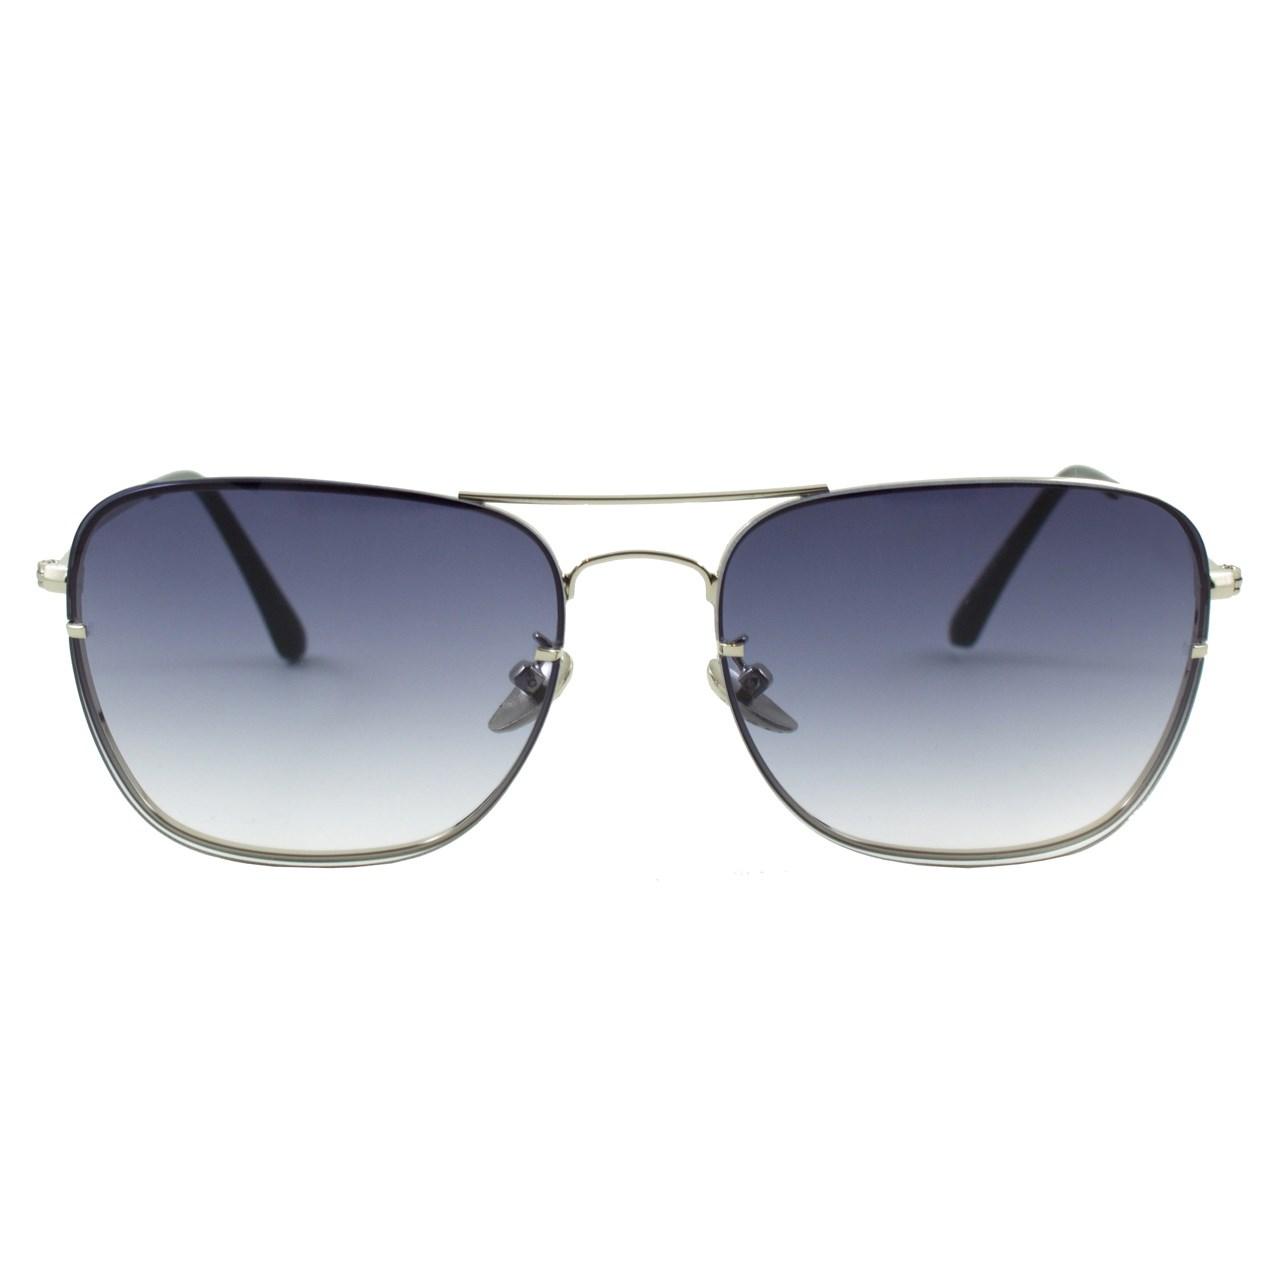 عینک آفتابی ویلی بولو مدل Denim Grey Series